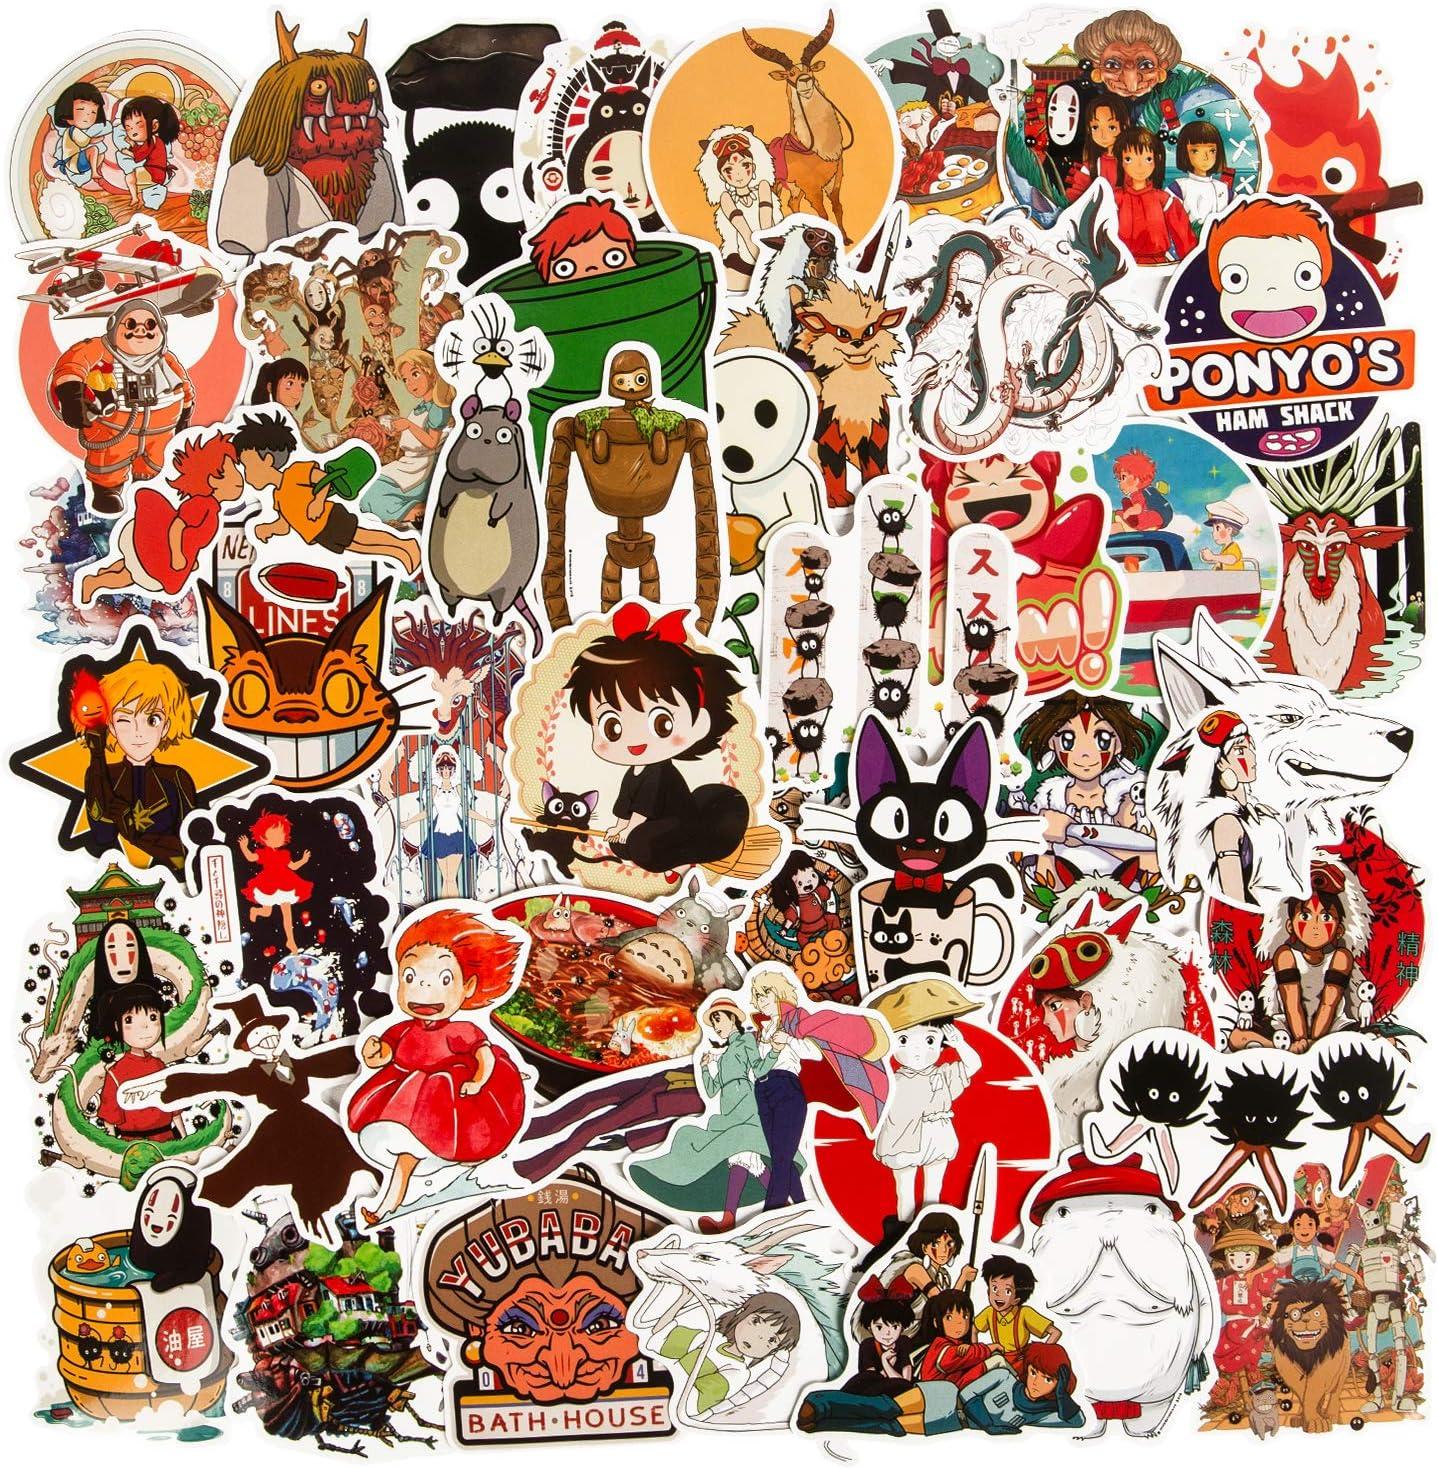 50Pcs Studio Ghibli Stickers, Miyazaki Hayao Animation Film Theme Anime Stickers for Laptop, Vinyl Spirited Away No Face Man Totoro Water Bottle Stickers for Skateboard Computer Luggage